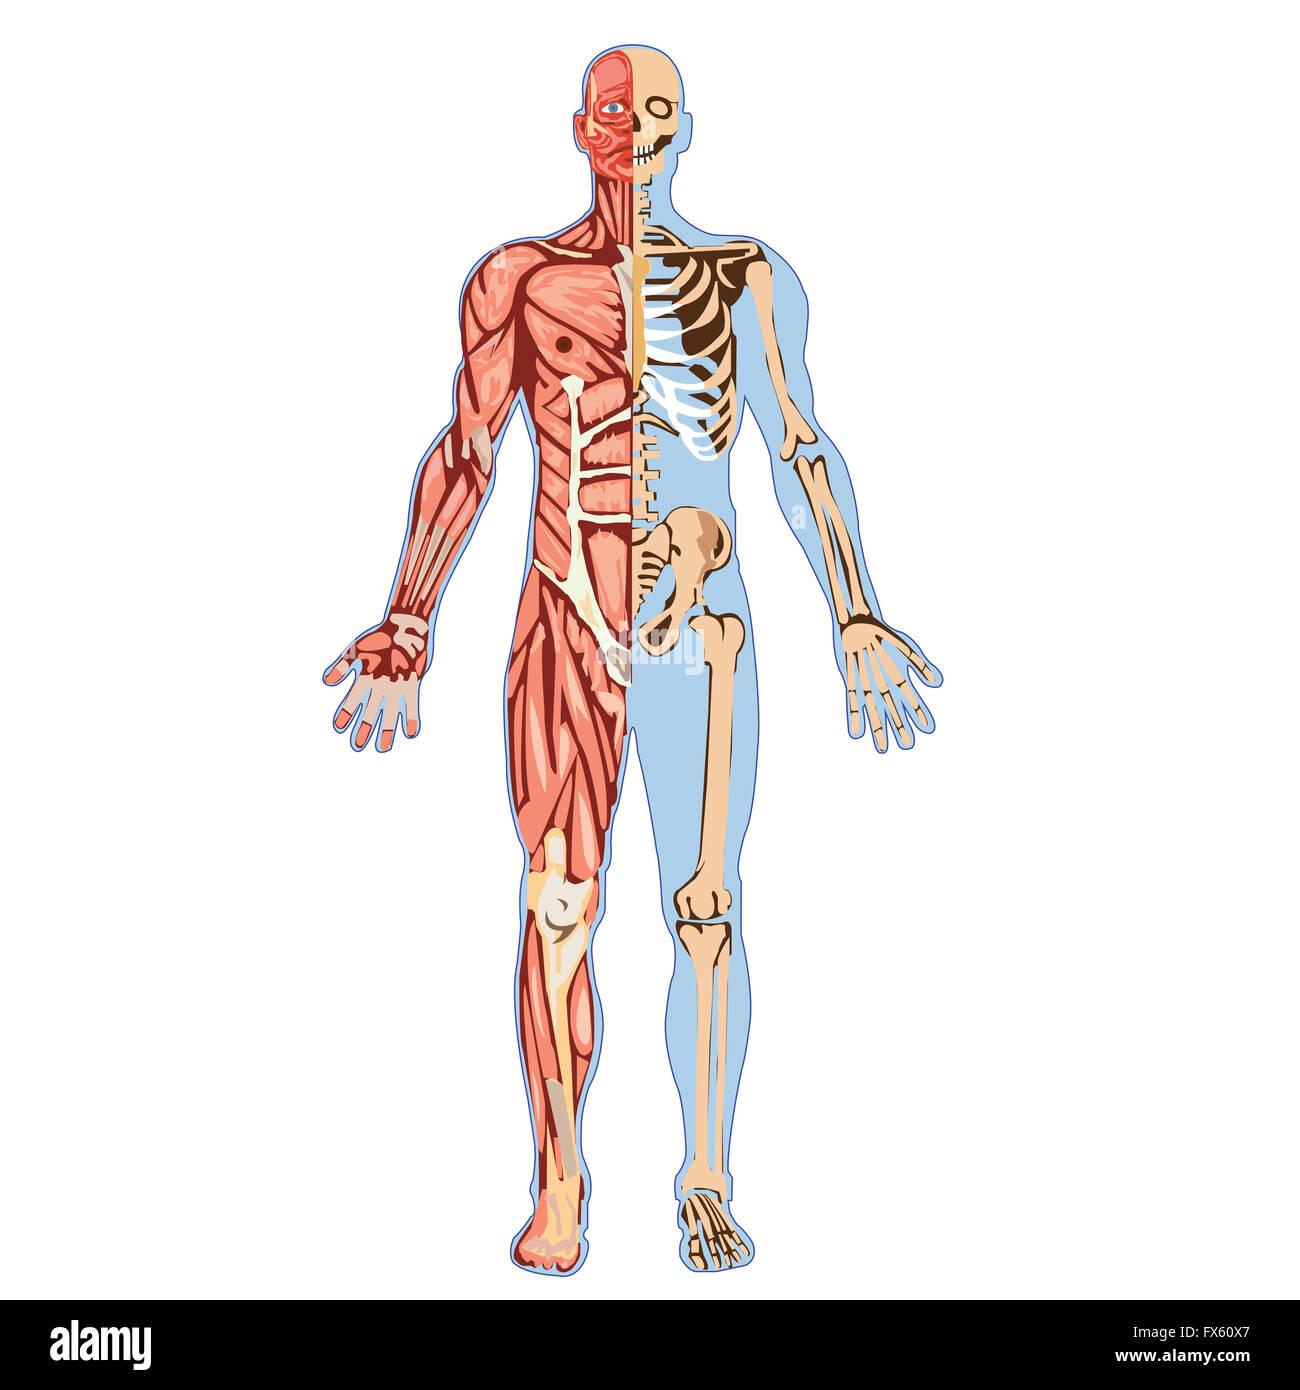 Human Body Anatomy Organs Stock Photos Human Body Anatomy Organs